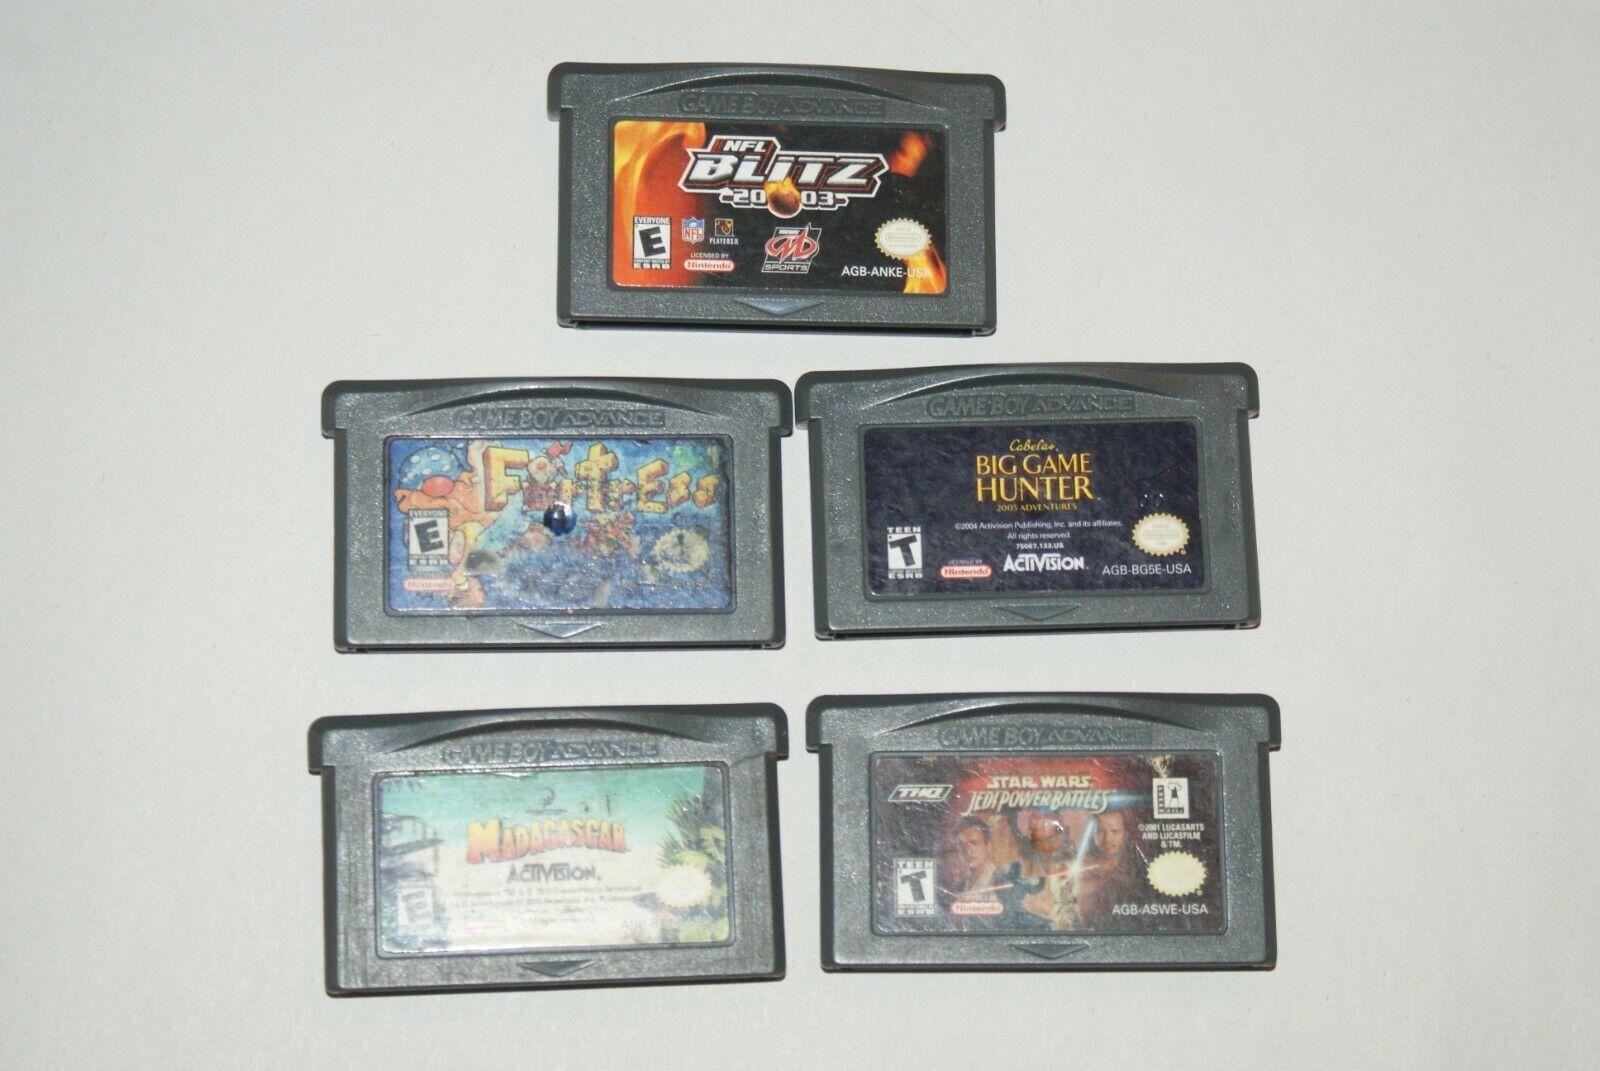 Lot 5 Nintendo Game Boy Advance Star Wars, Big Game Hunter, NFL, Fortress Tested - $8.50